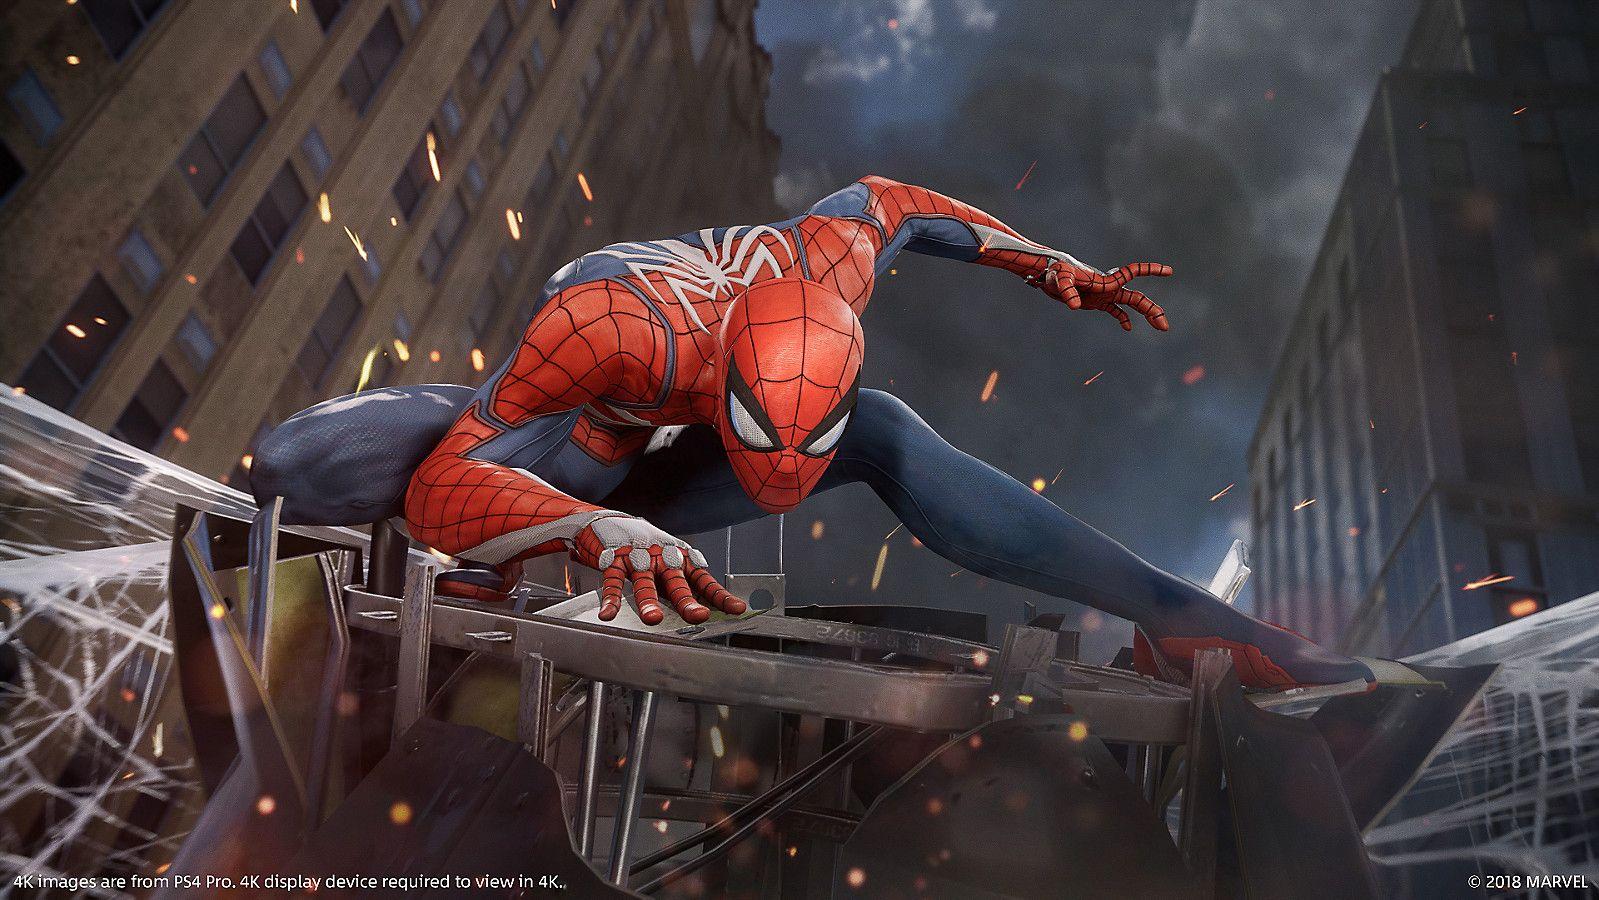 Spider-Man PS4: Iron Spider Suit Revealed as Pre-Order Bonus